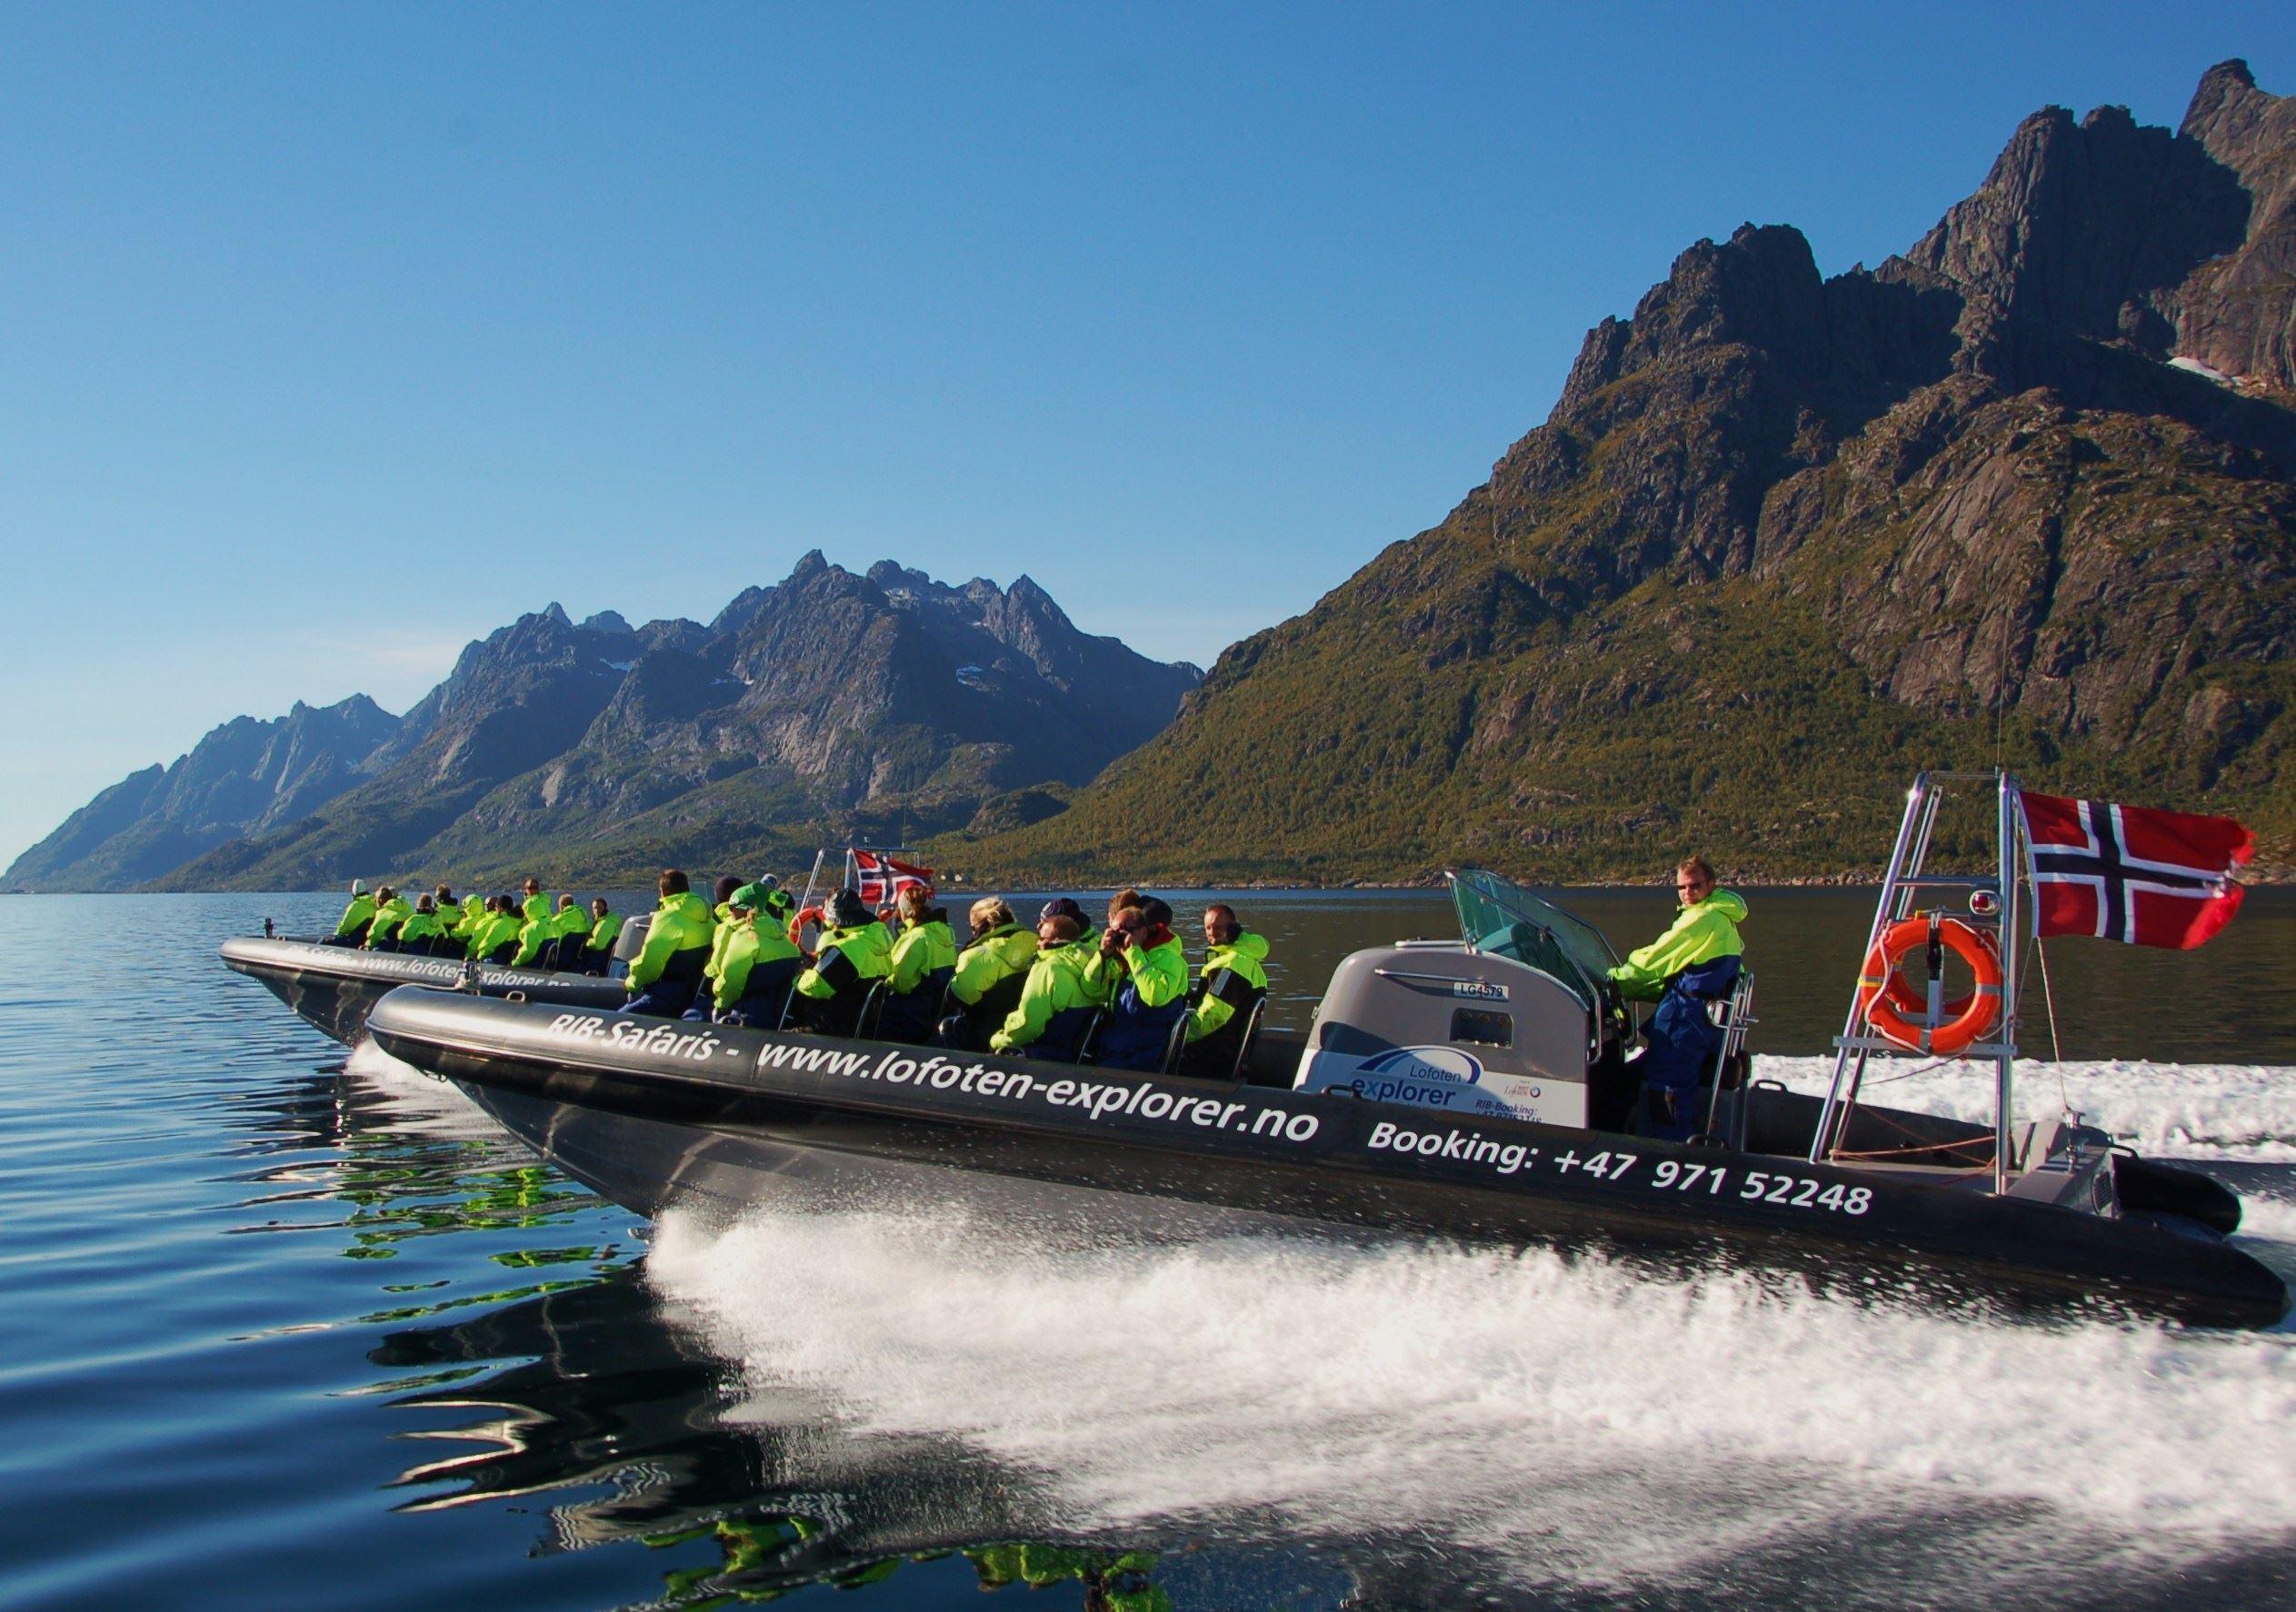 Trollfjord & sea eagle RIB-safari